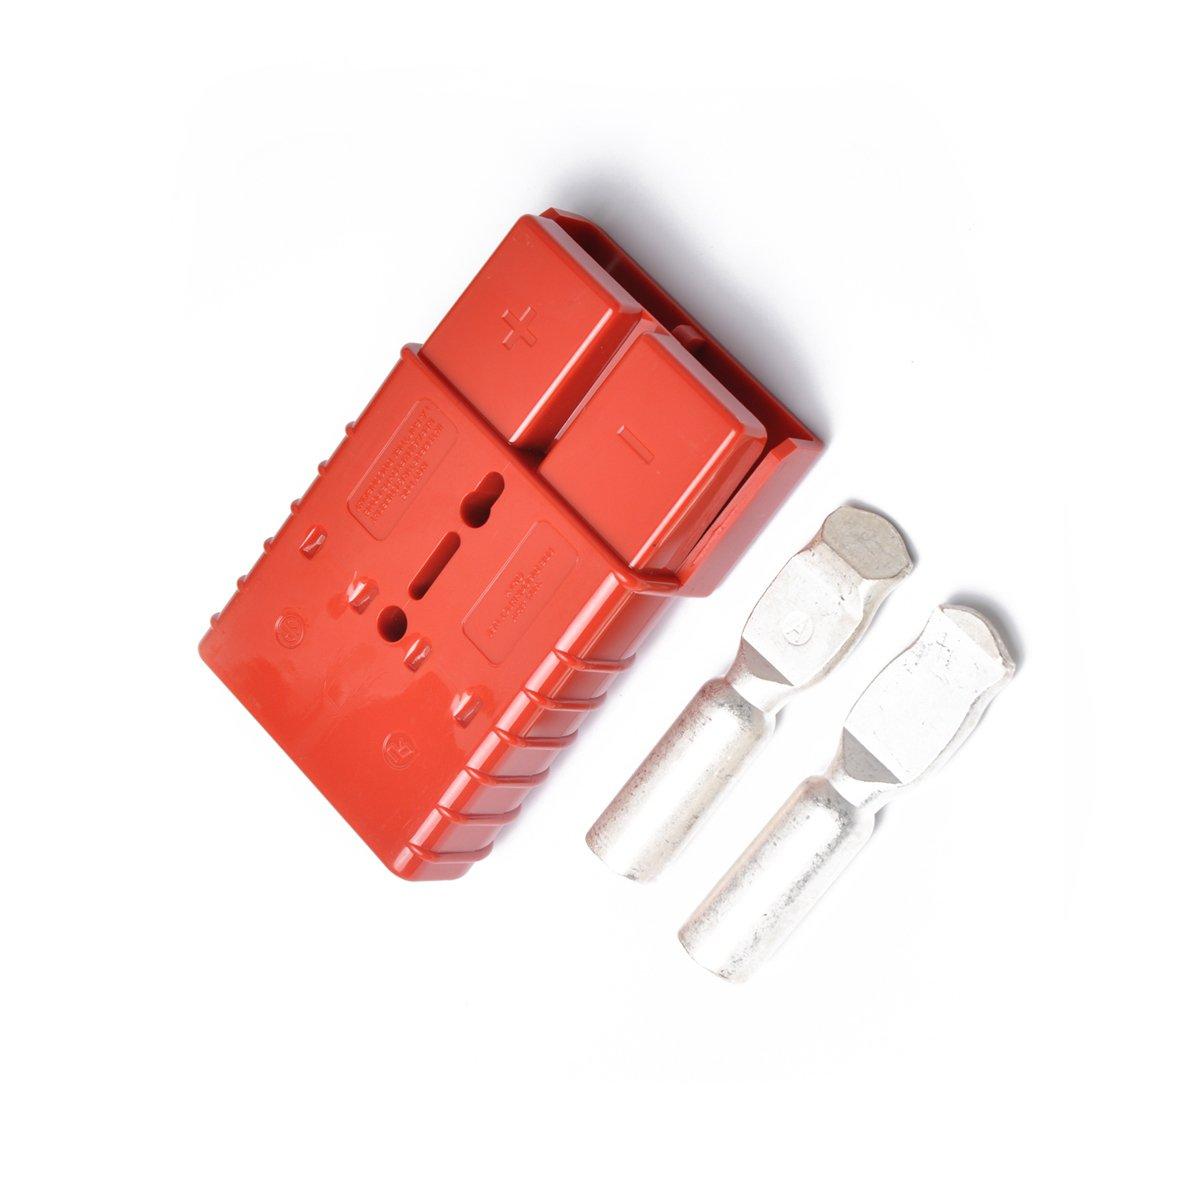 WINOMO 350A 600V Premium Anderson Style Plug Exterior Connector for Winch Trailer red